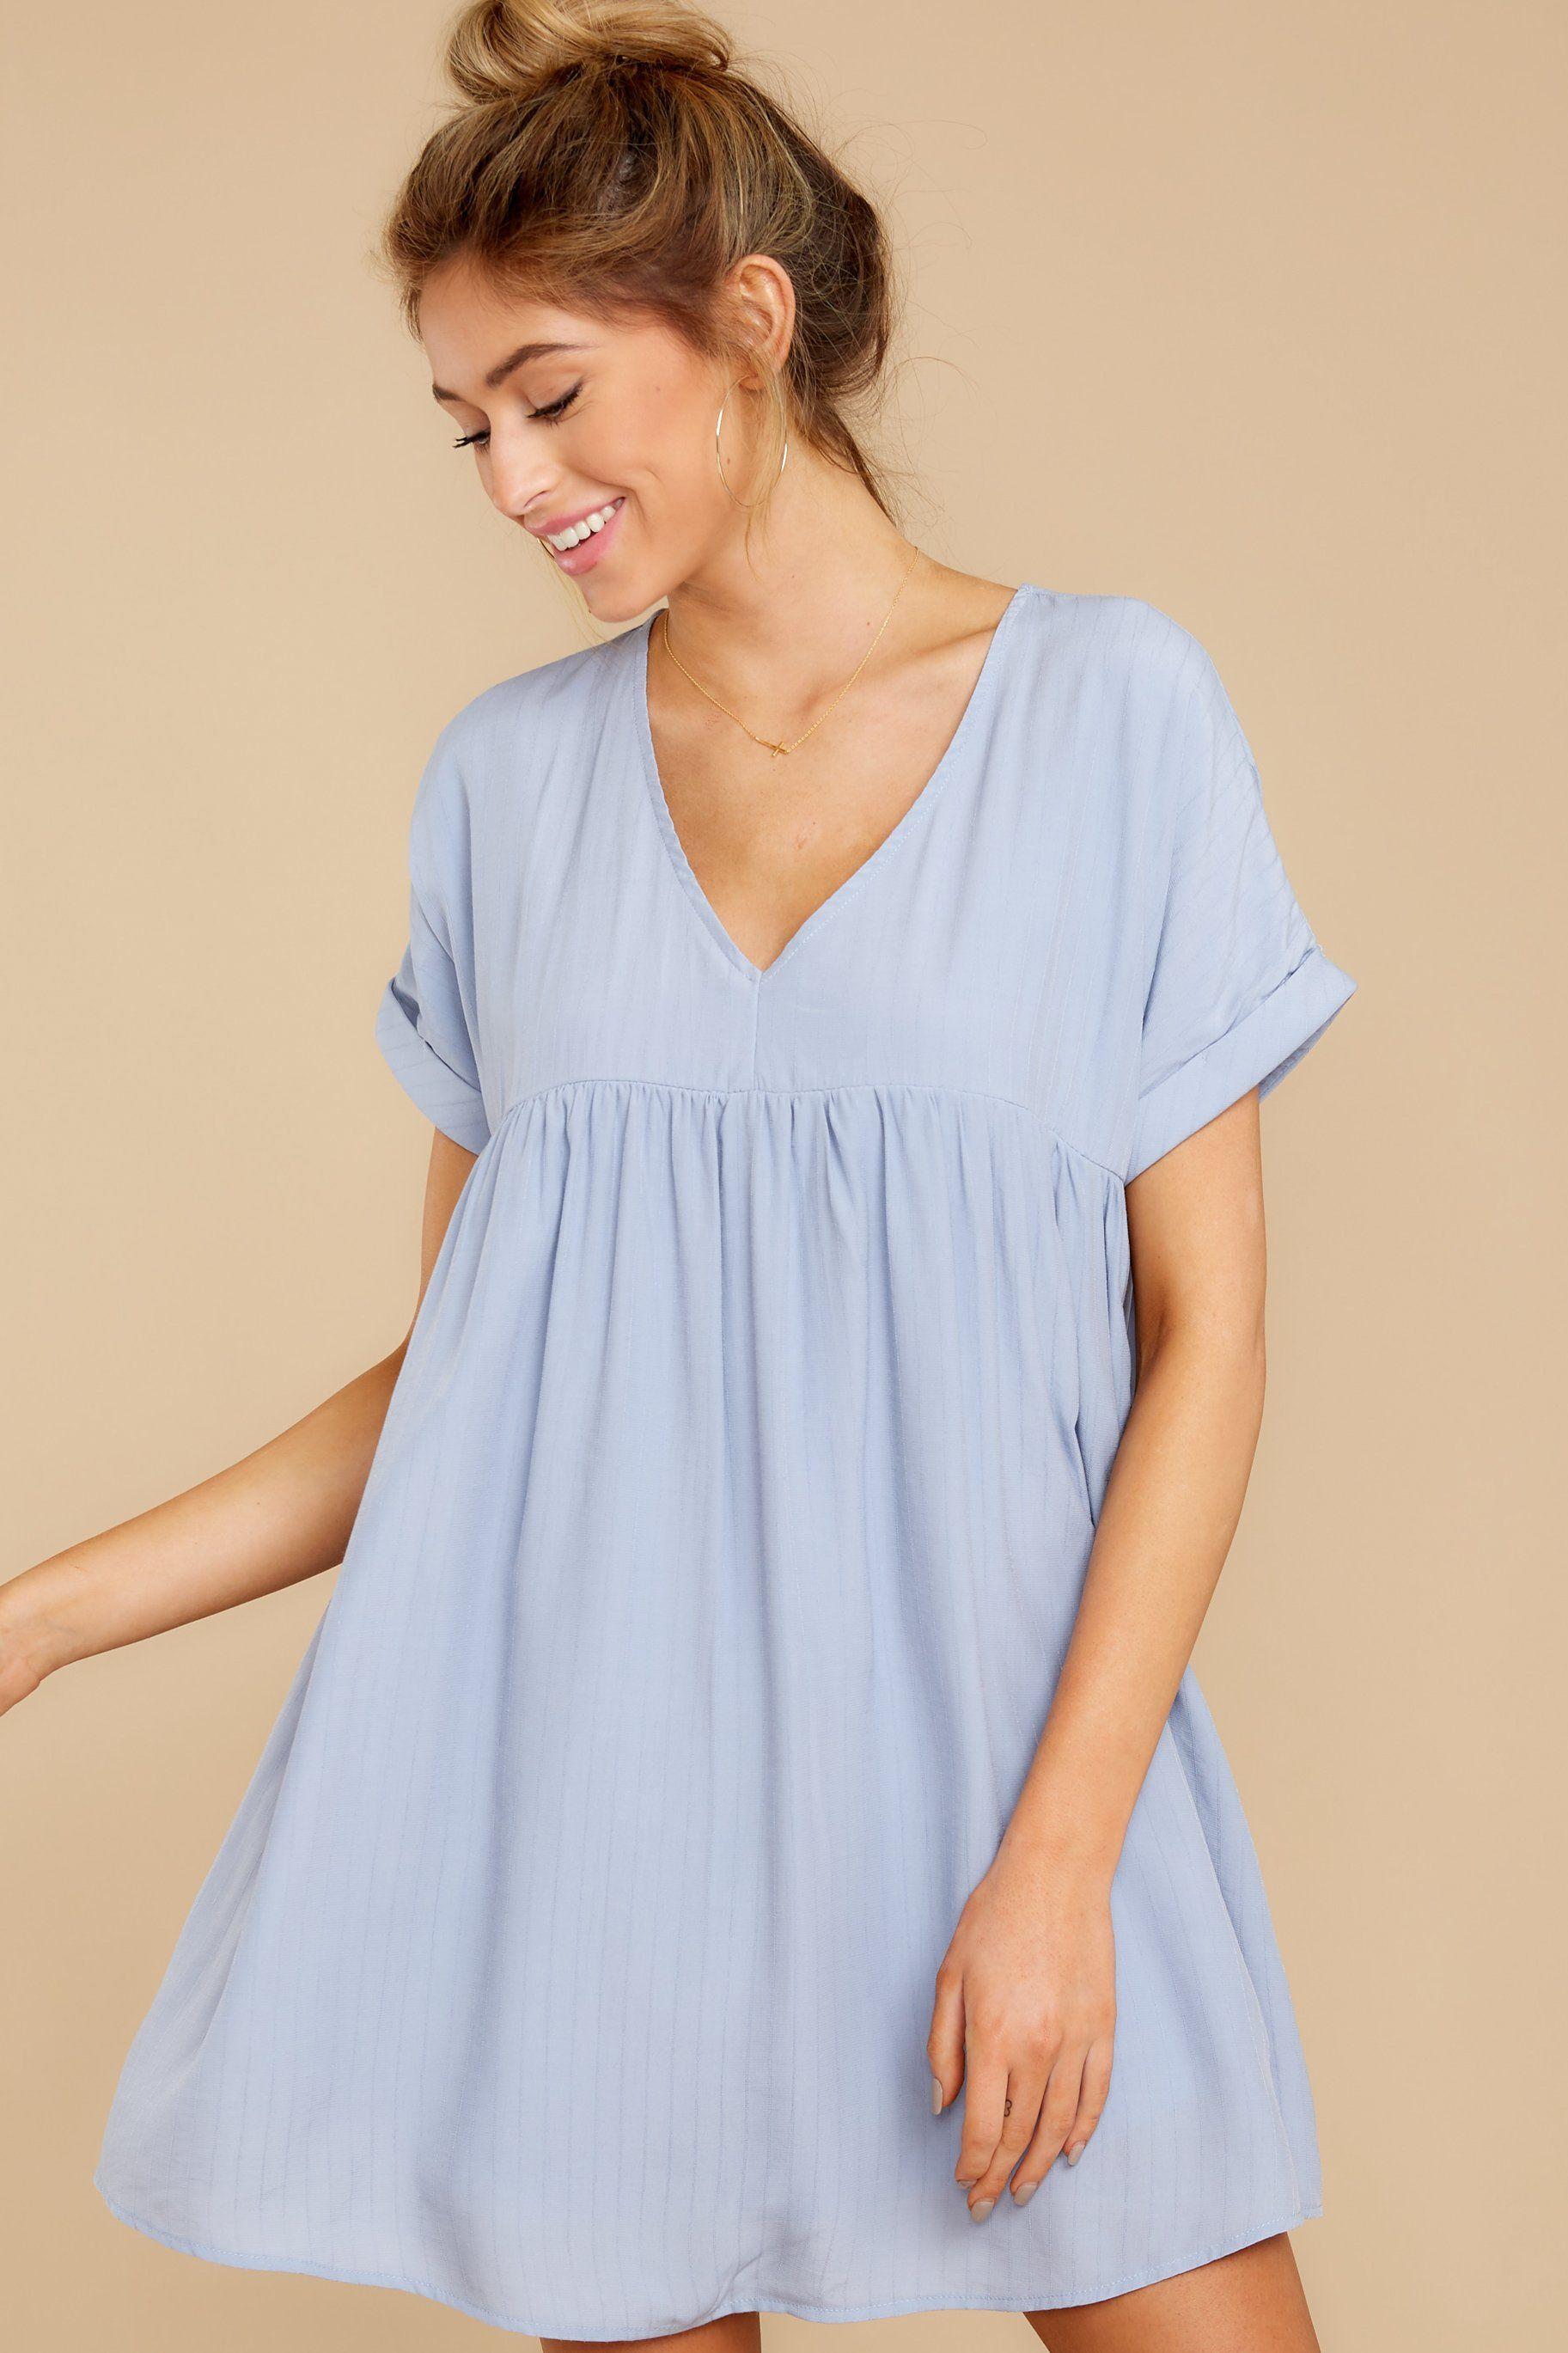 Dainty Blue Dress Babydoll Striped Short Dress Dress 44 00 Red Dress Dusty Blue Dress White Print Dress Blue Dresses [ 2738 x 1825 Pixel ]